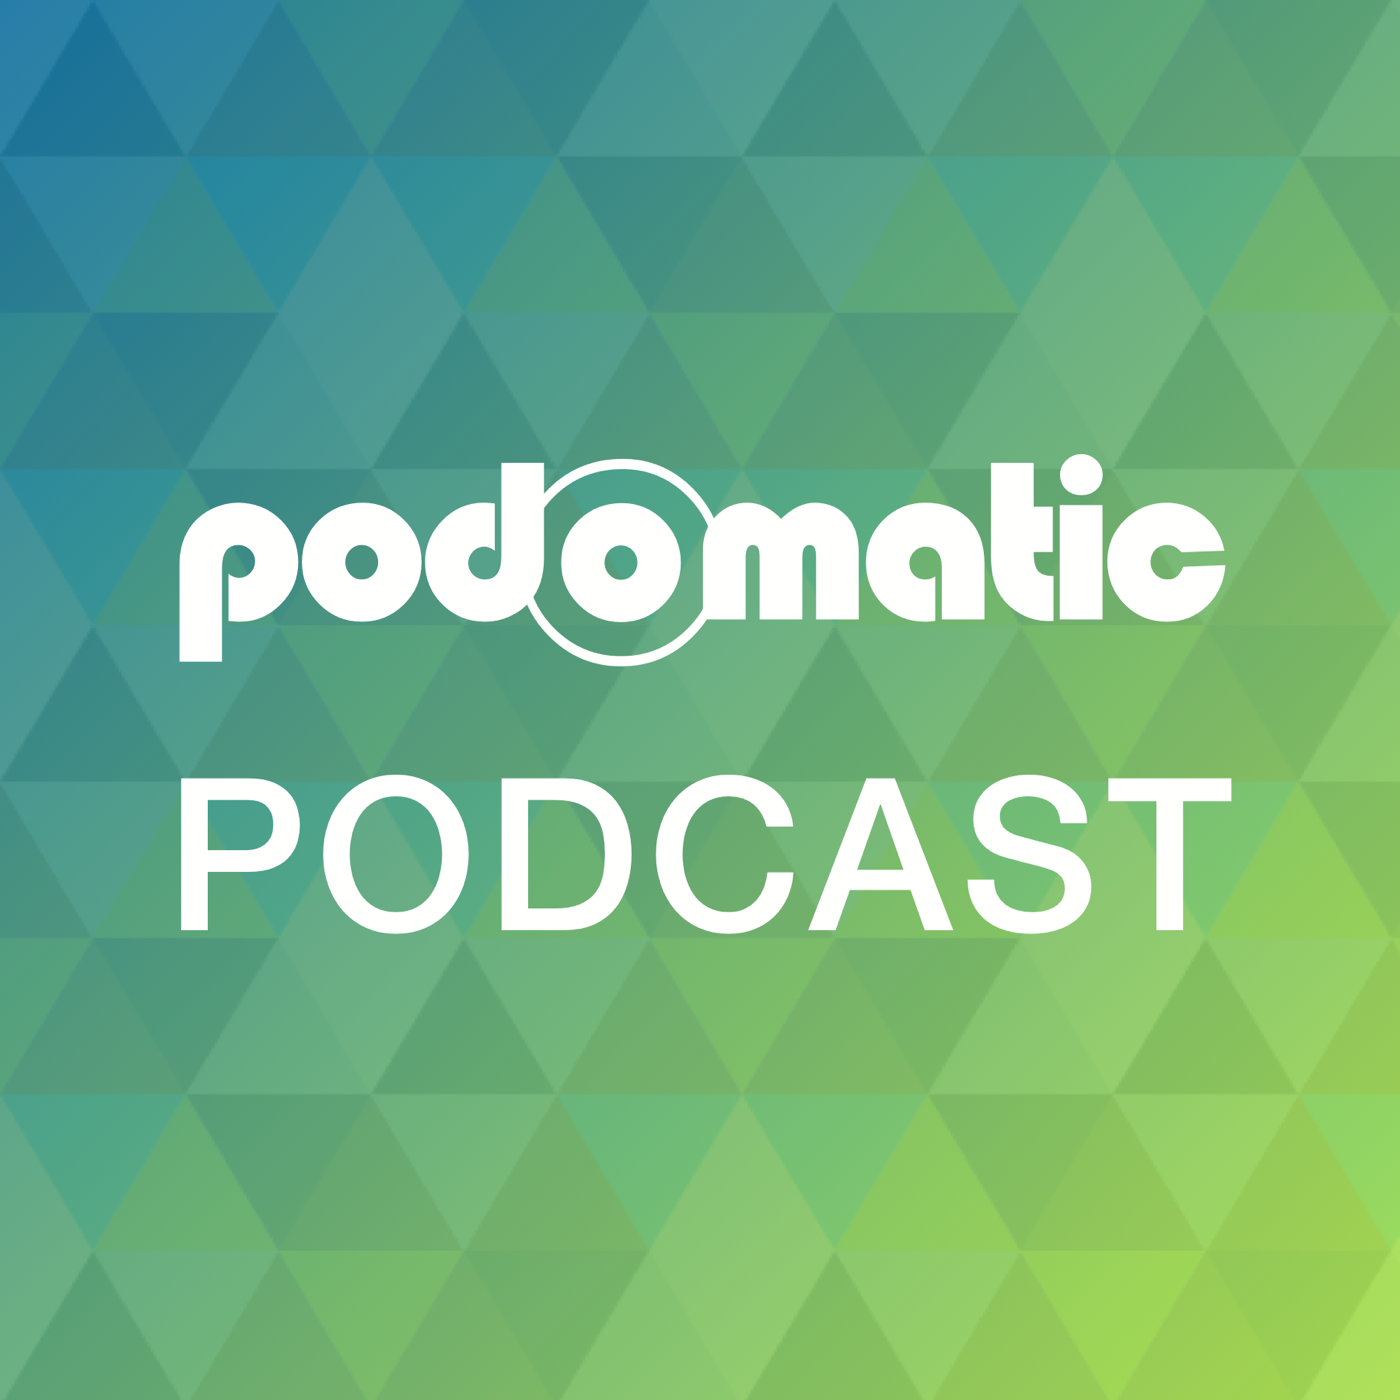 Dan S' Podcast